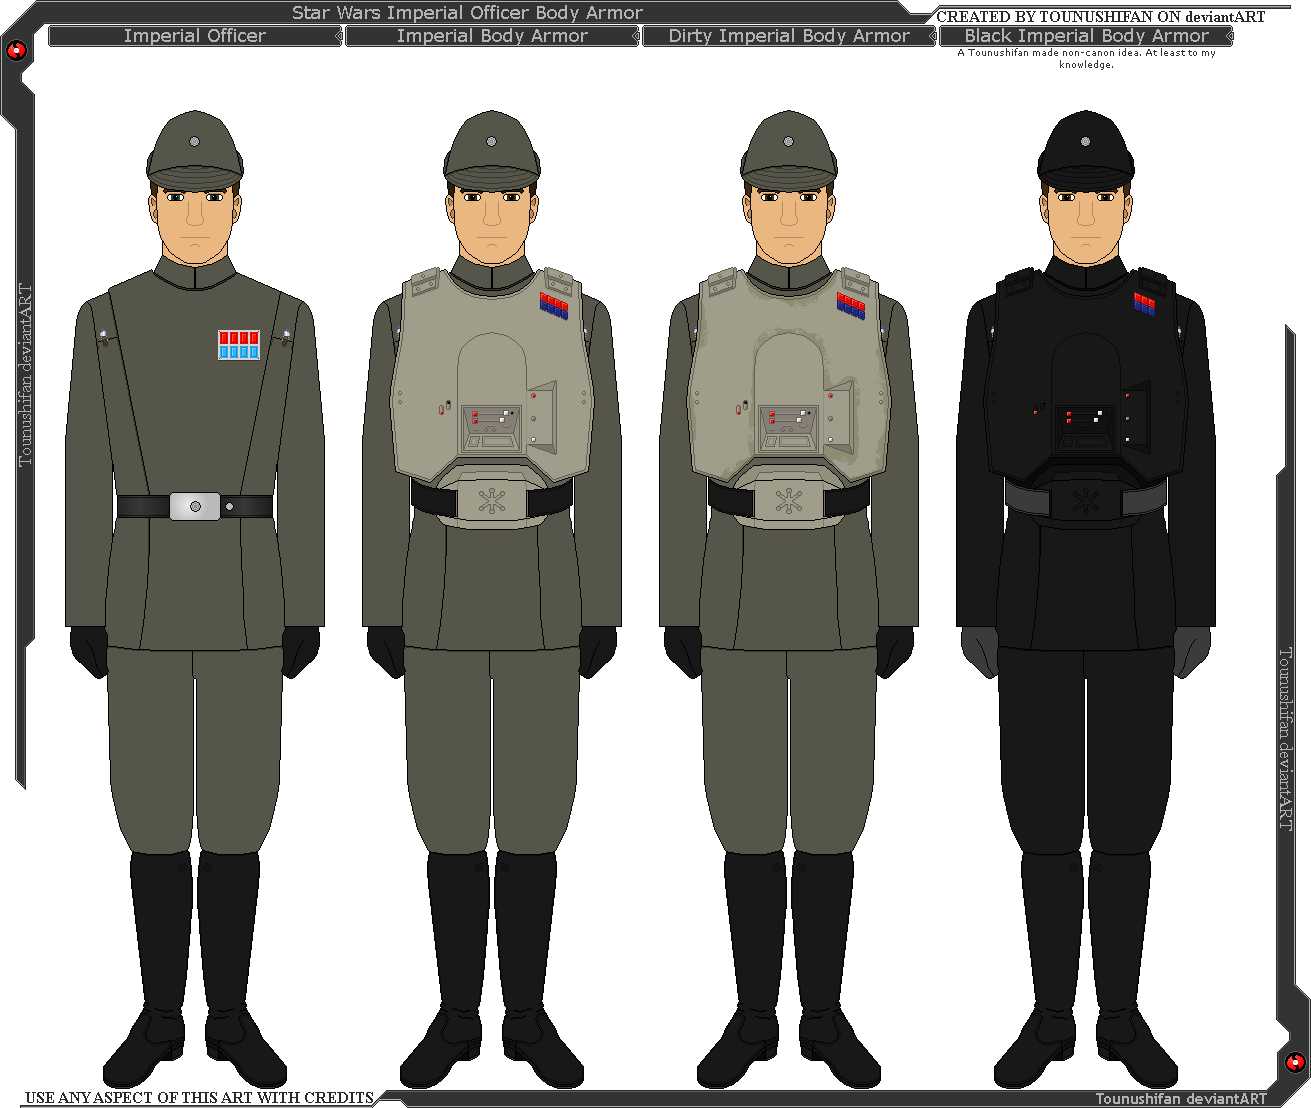 Star Wars - Imperial Officer Body Armor by Grand-Lobster-King on DeviantArt